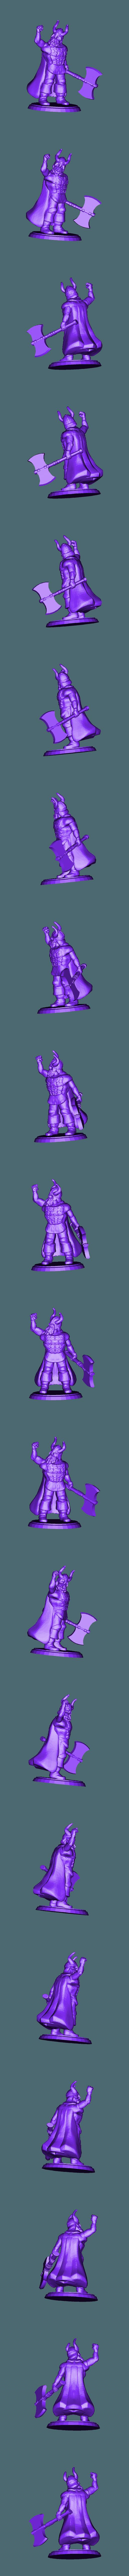 dwarven_warrior_salute.stl Download free STL file Fantasy Mini Collection (multiple poses) • 3D printable object, stockto